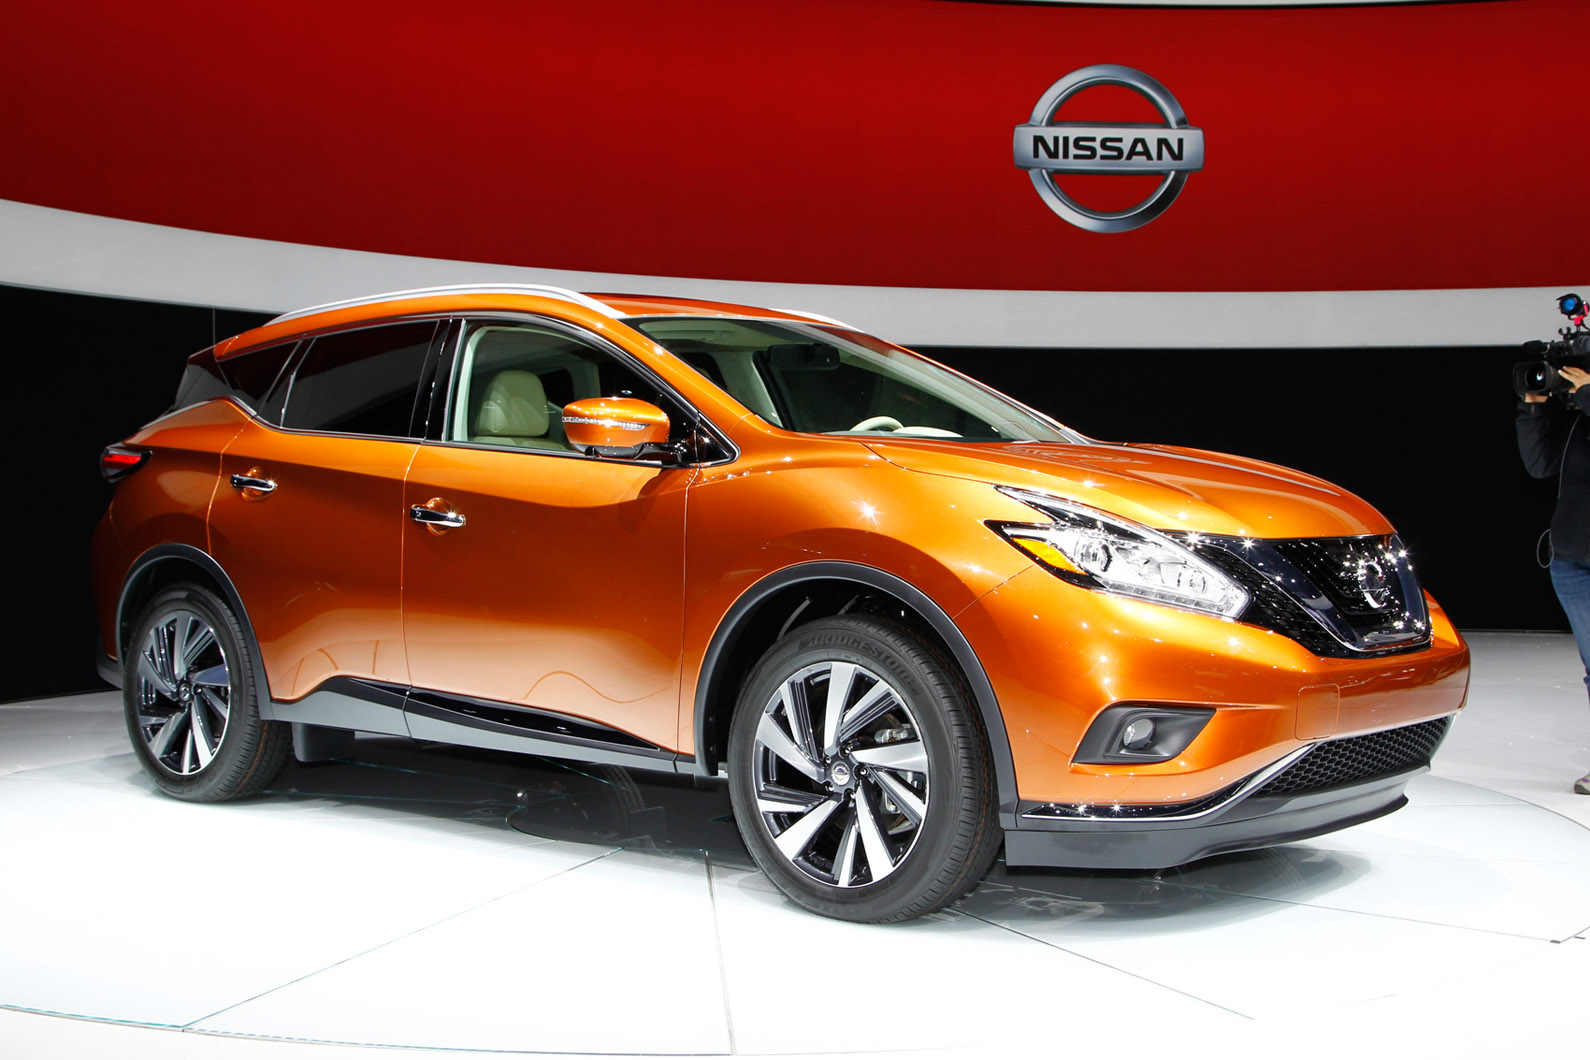 2014 - [Nissan] Murano III - Page 3 Ny-batch-1-053_0